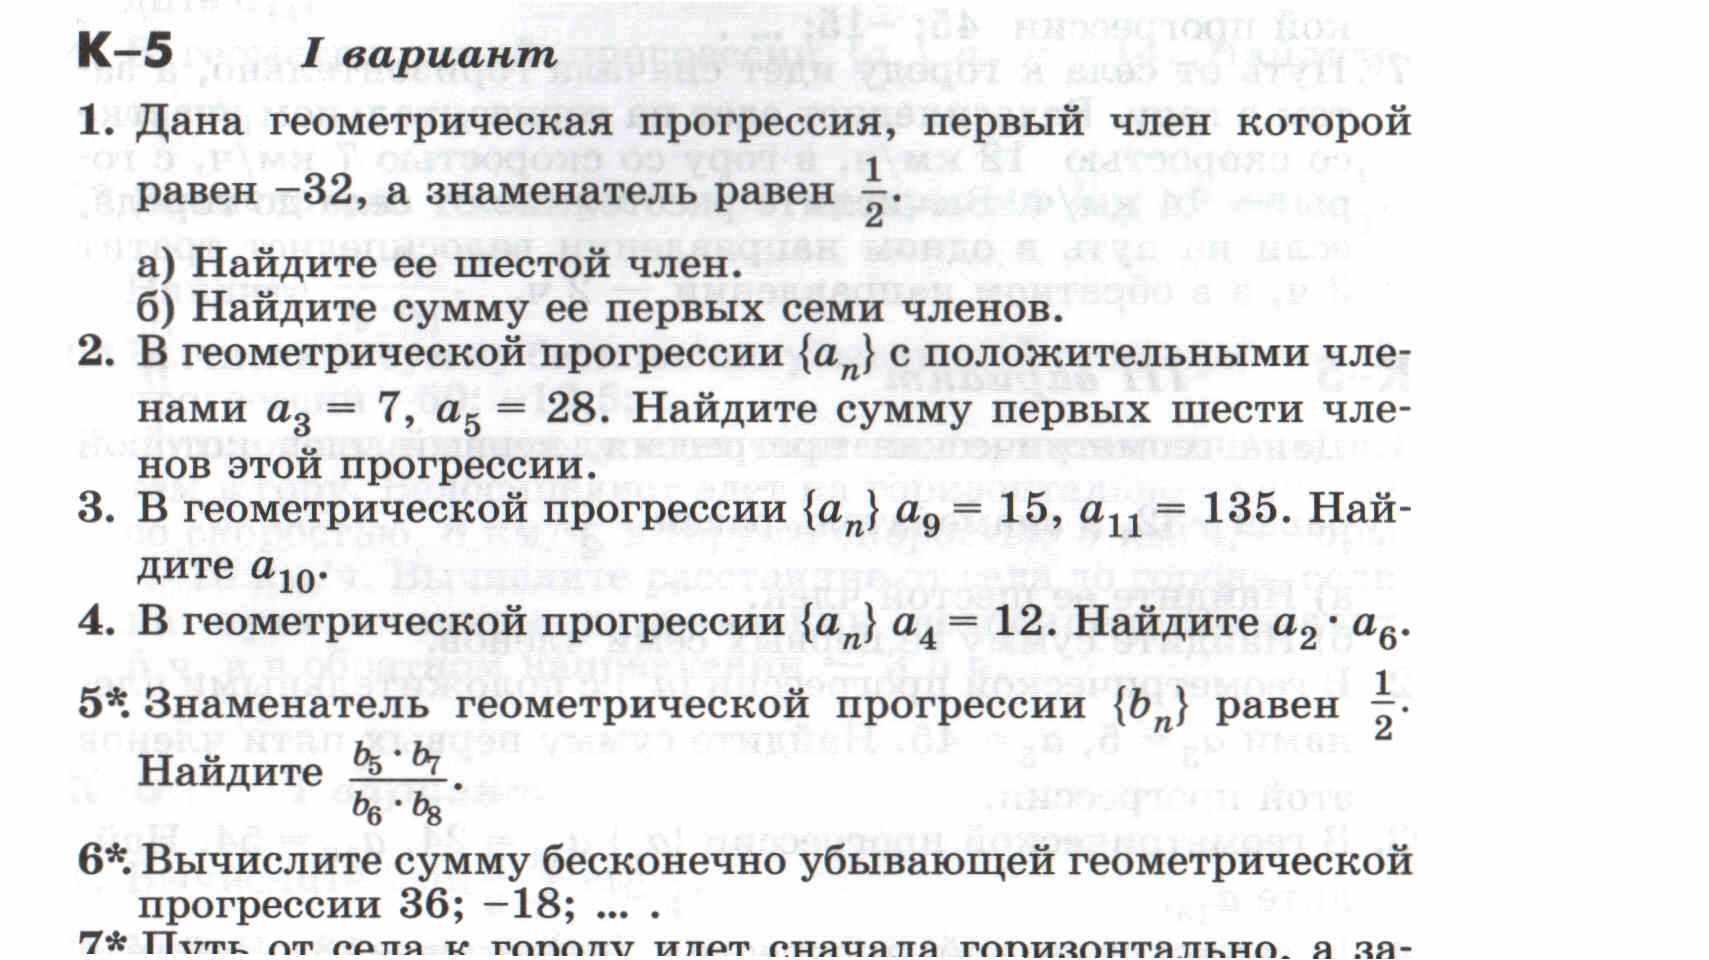 C:\Documents and Settings\Школа\Local Settings\Temporary Internet Files\Content.Word\Отсканировано 18.04.2013 9-21_000.jpg